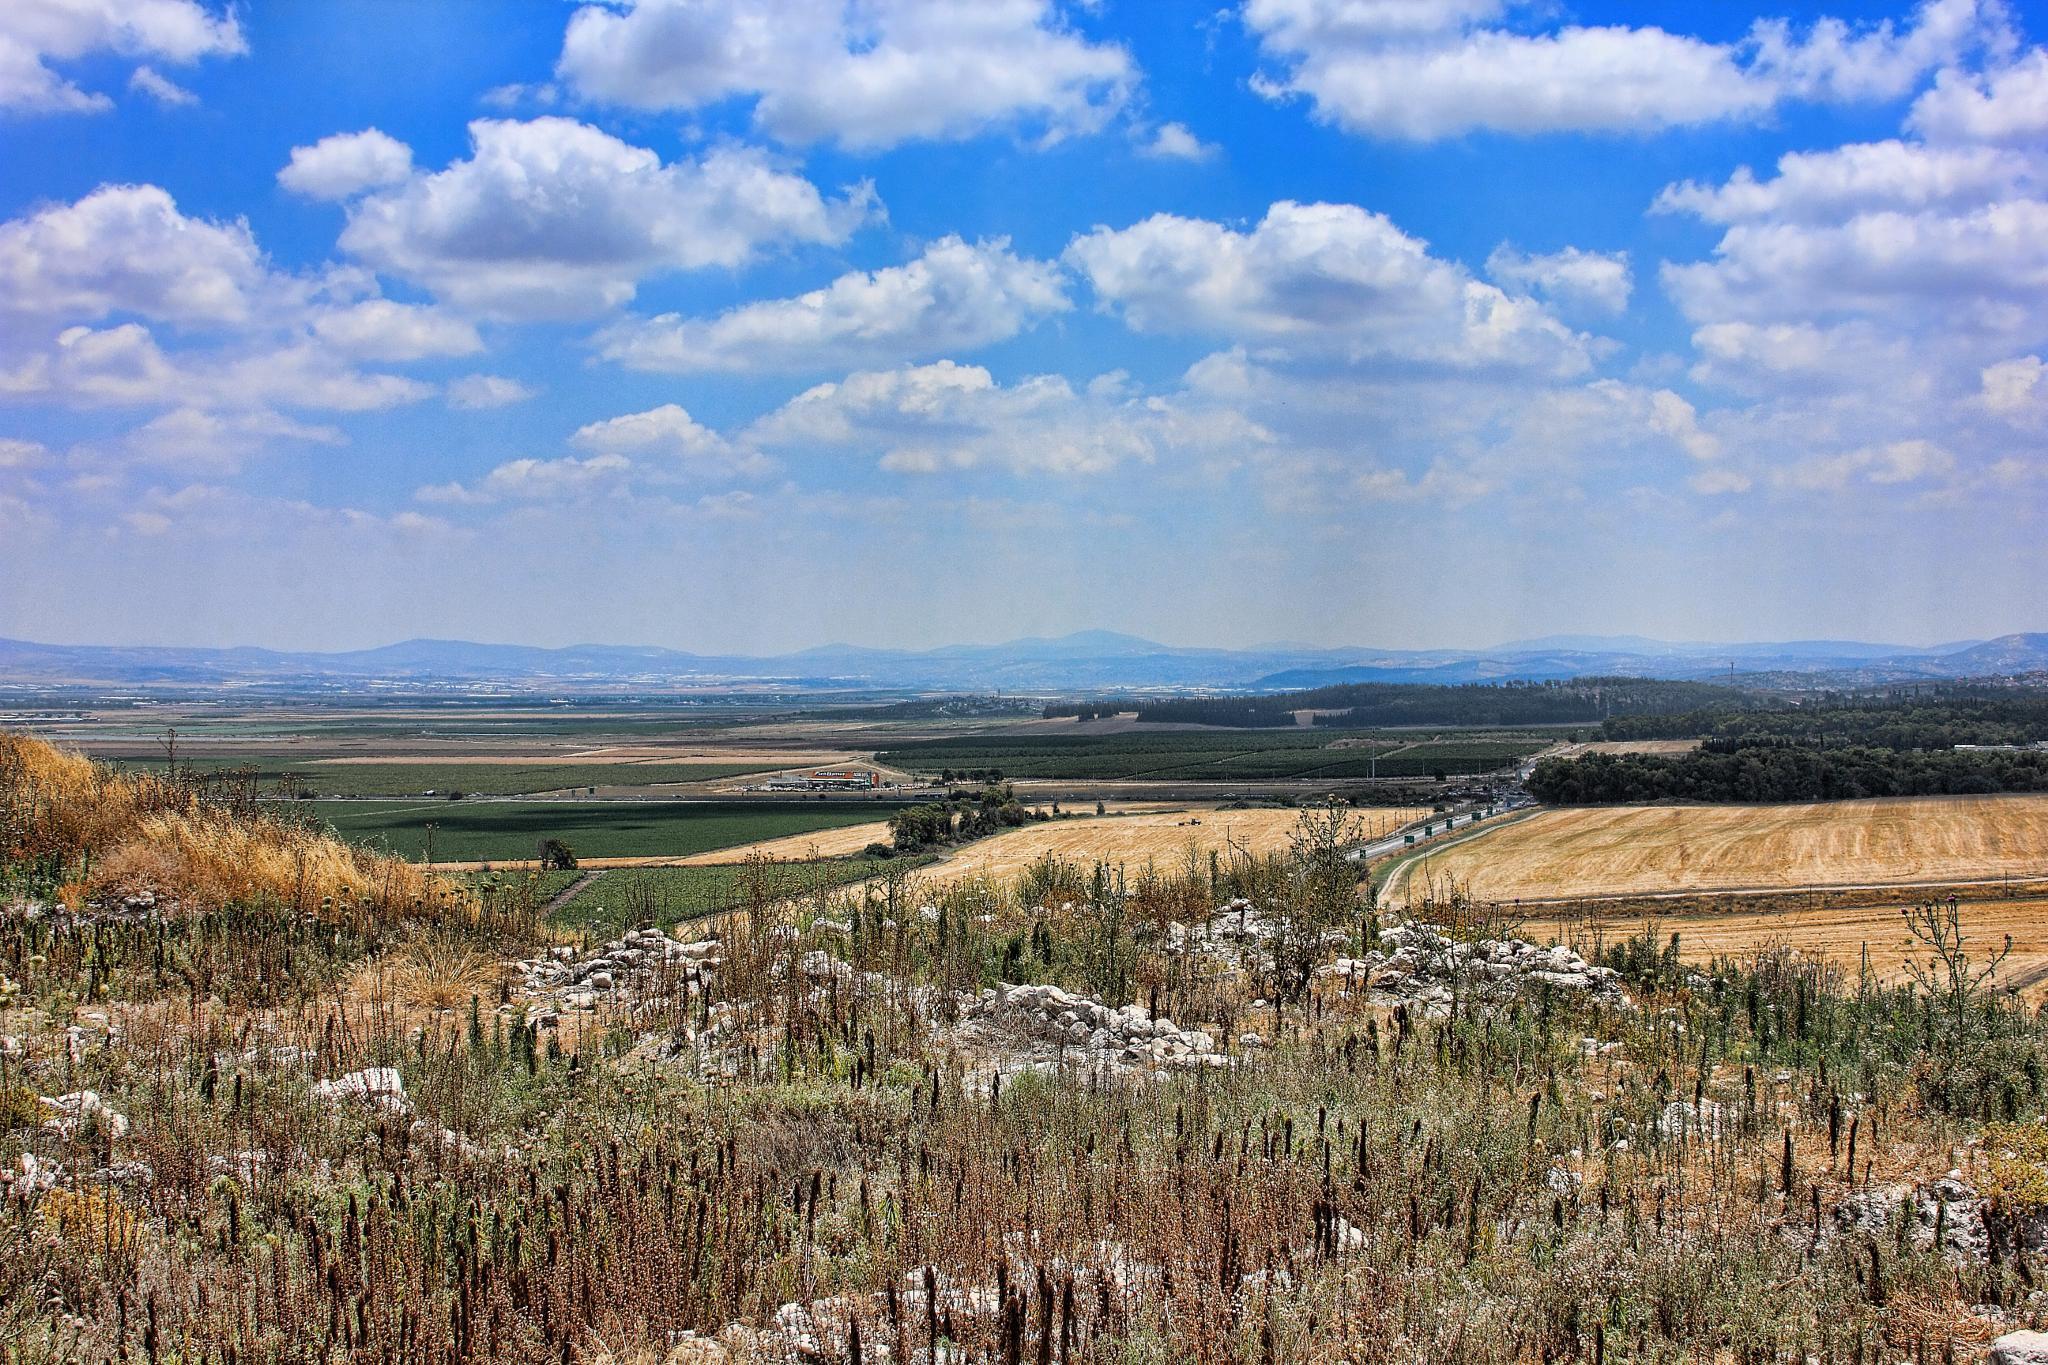 Valey .Israel  by Sam Ribinik